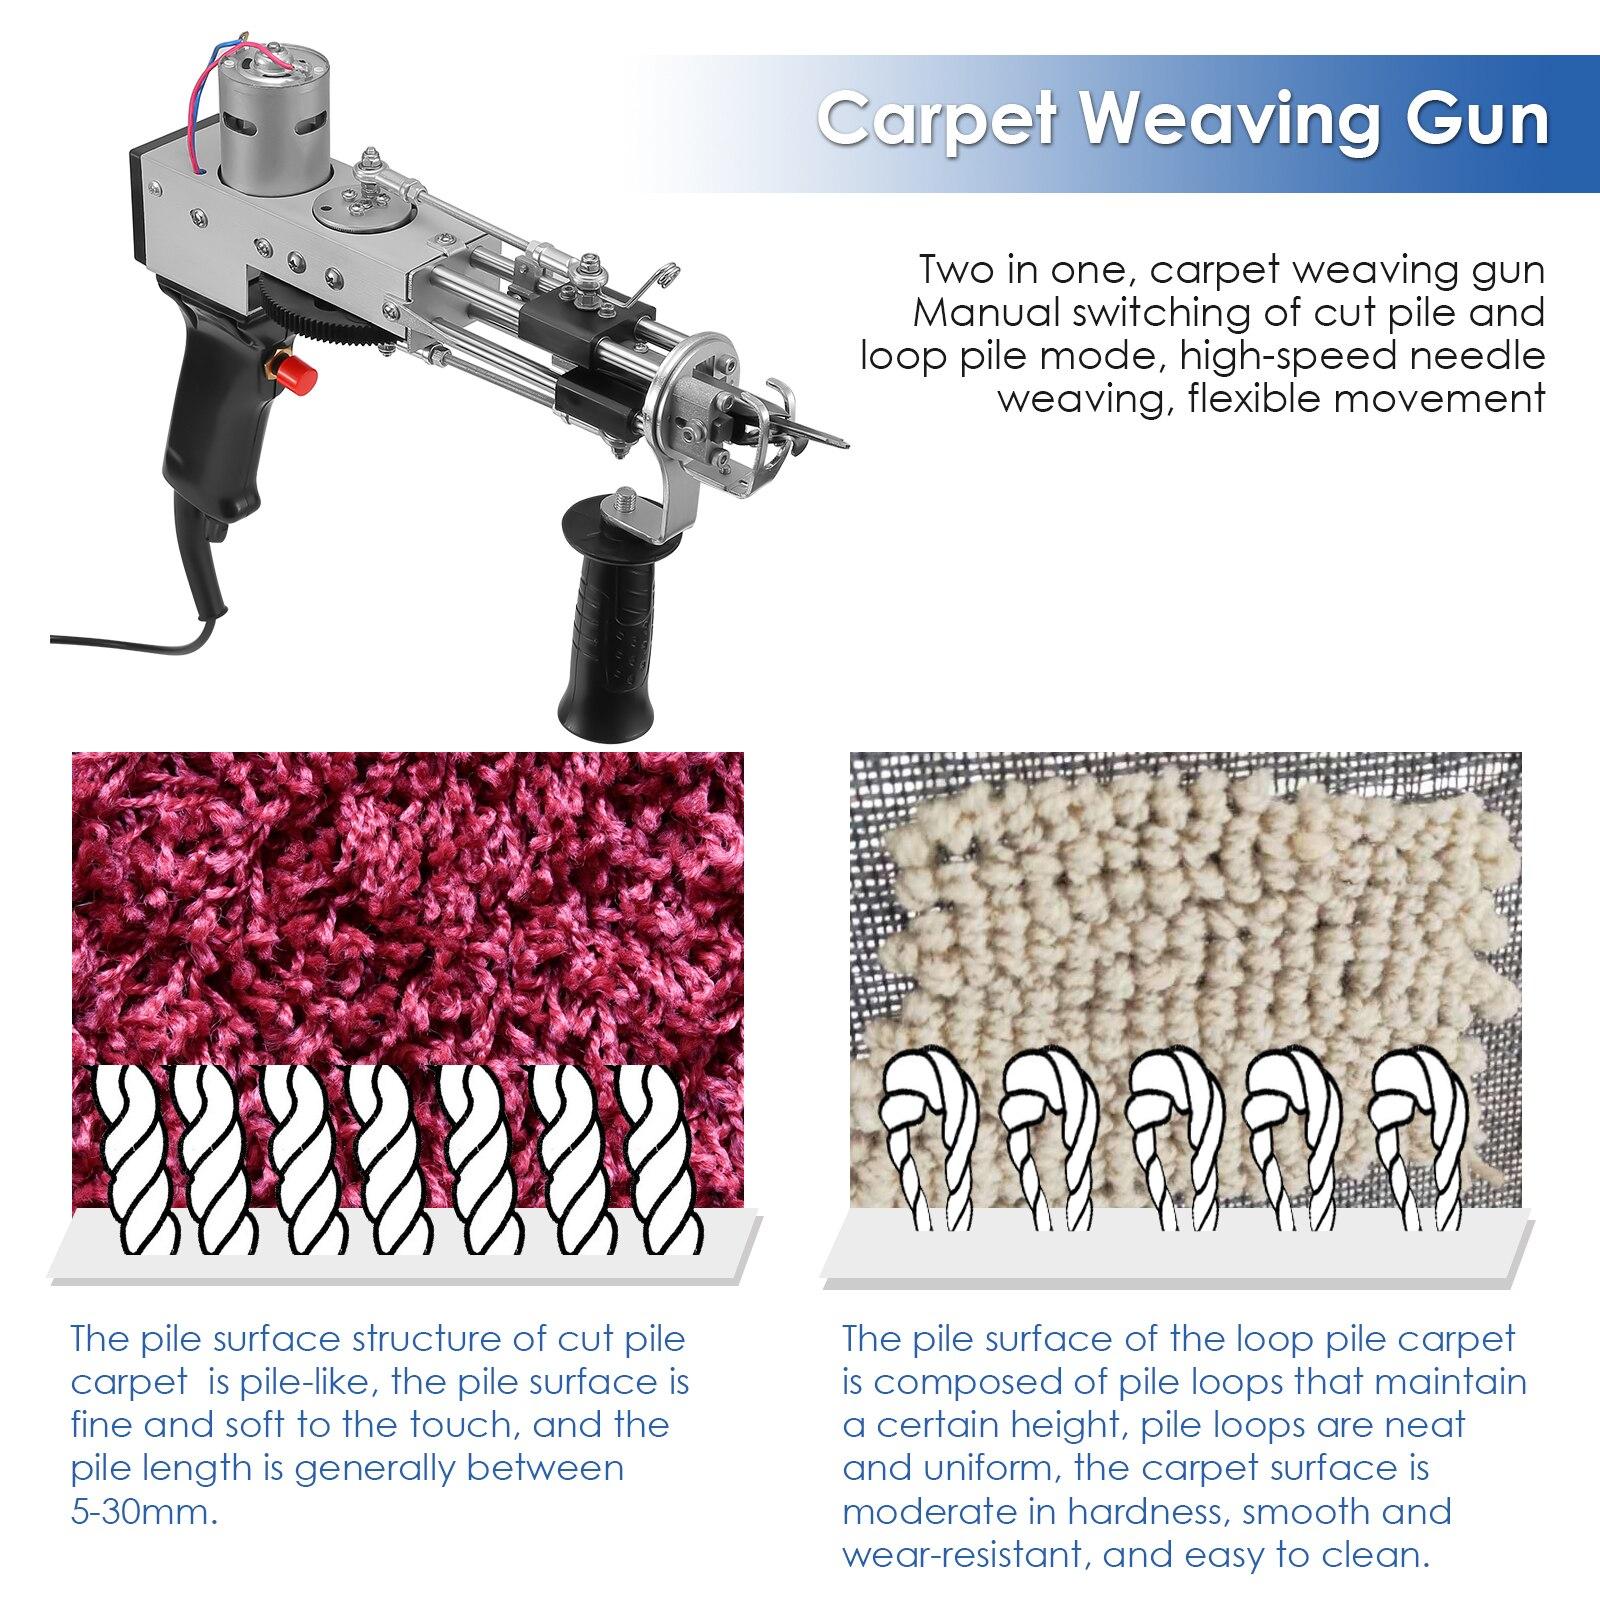 Electric Tufting Gun Carpet Weaving Machine Flocking Machine Industrial Embroidery Machine Cut Pile Loop Pile Knitting Machine enlarge